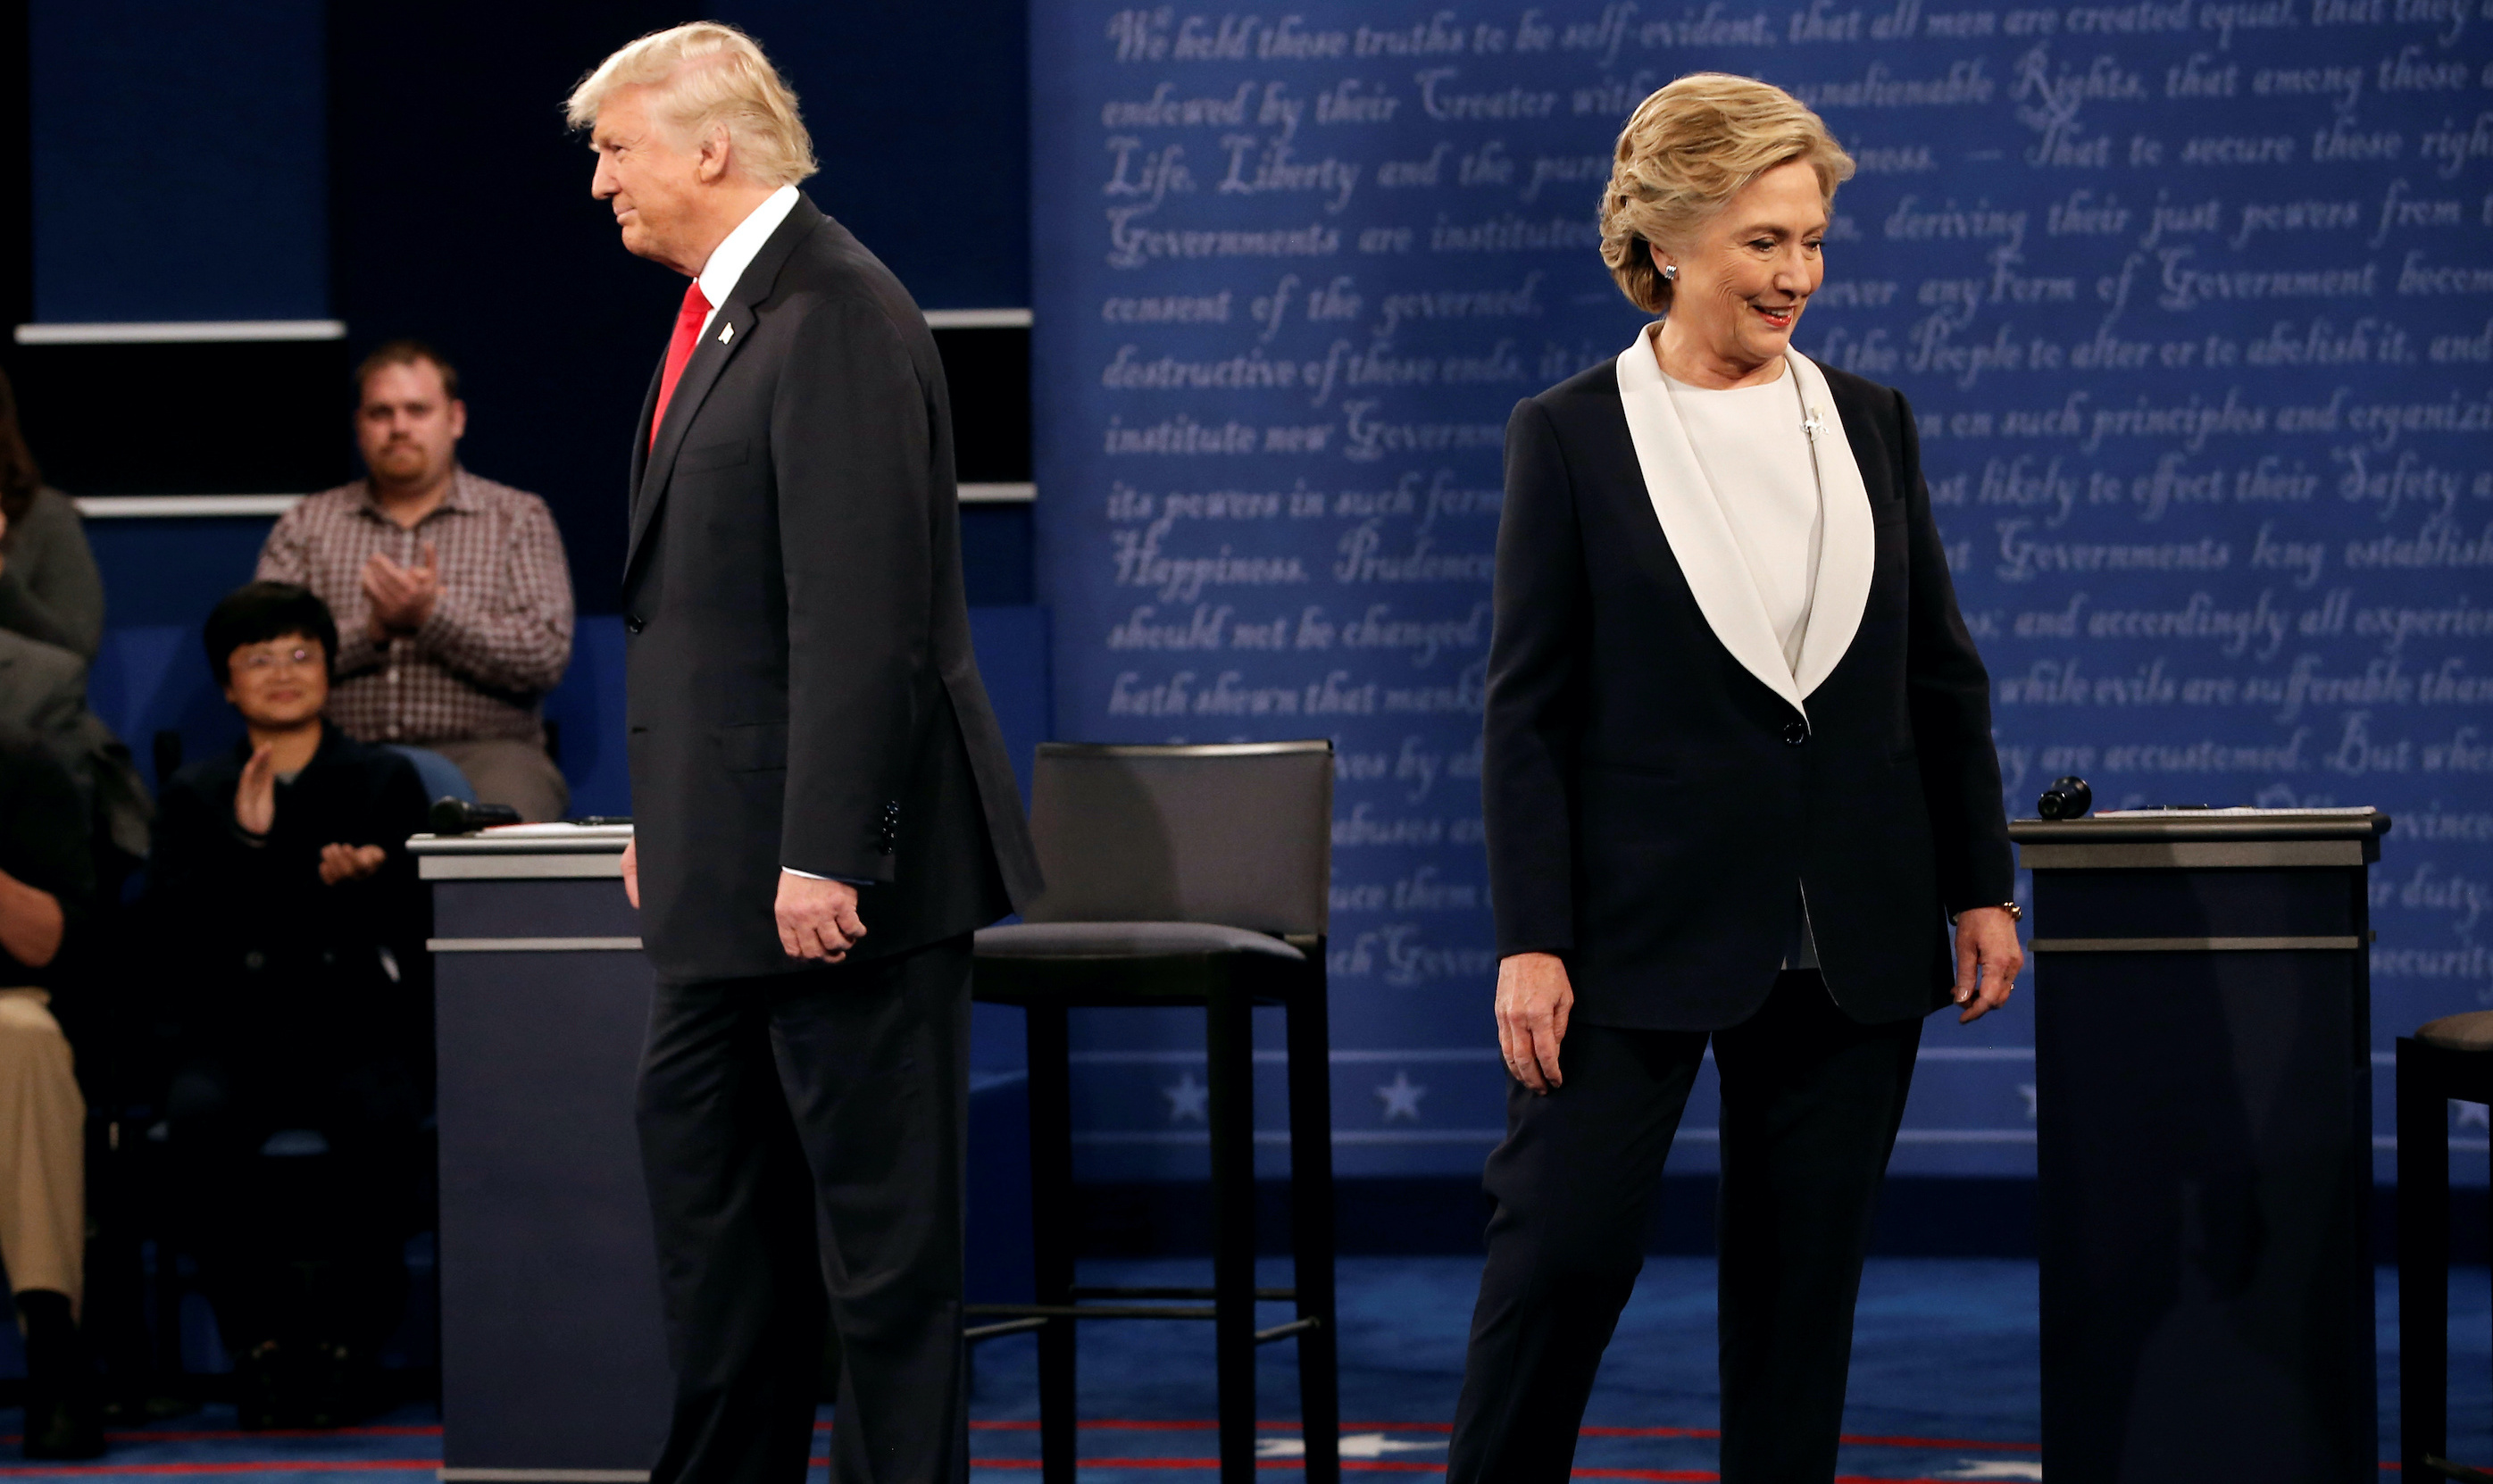 Clinton vs. Trump: The second 2016 presidential debate